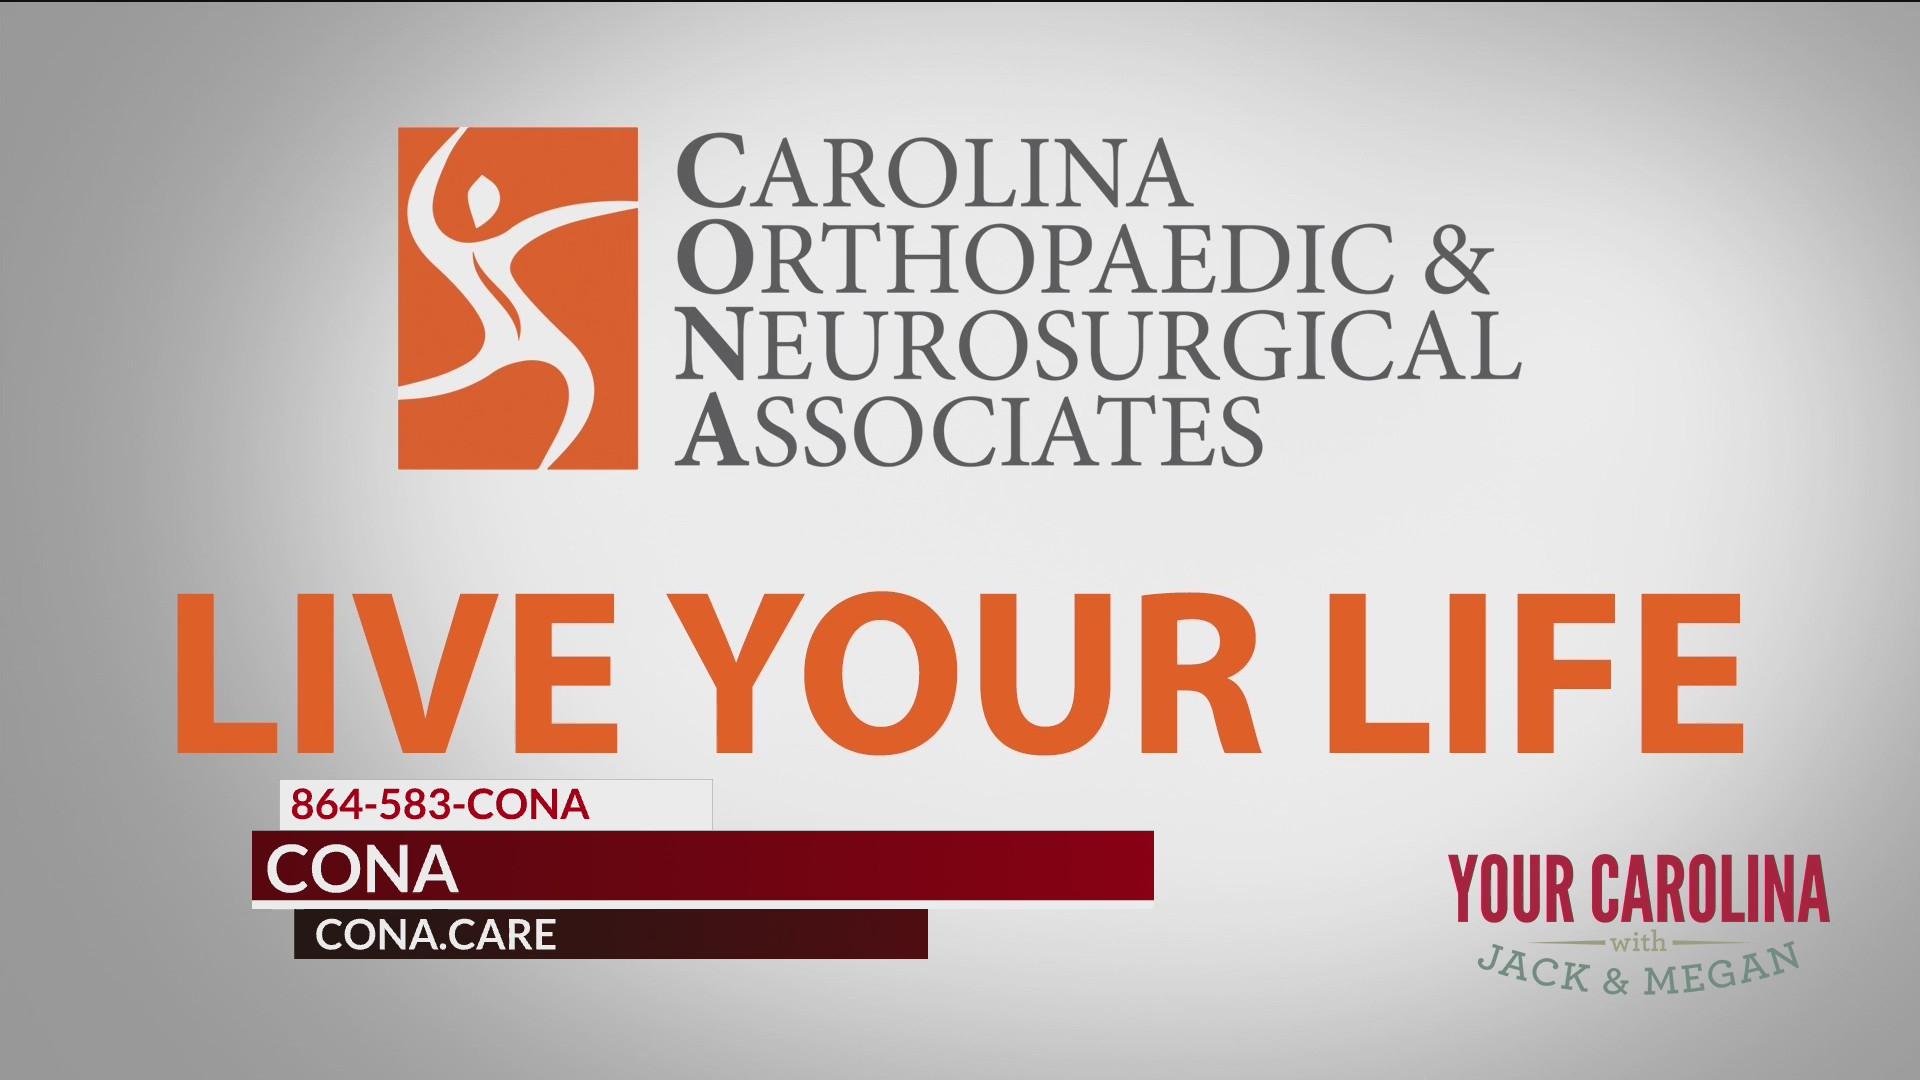 Carolina Orthopaedic and Neurosurgical Associates